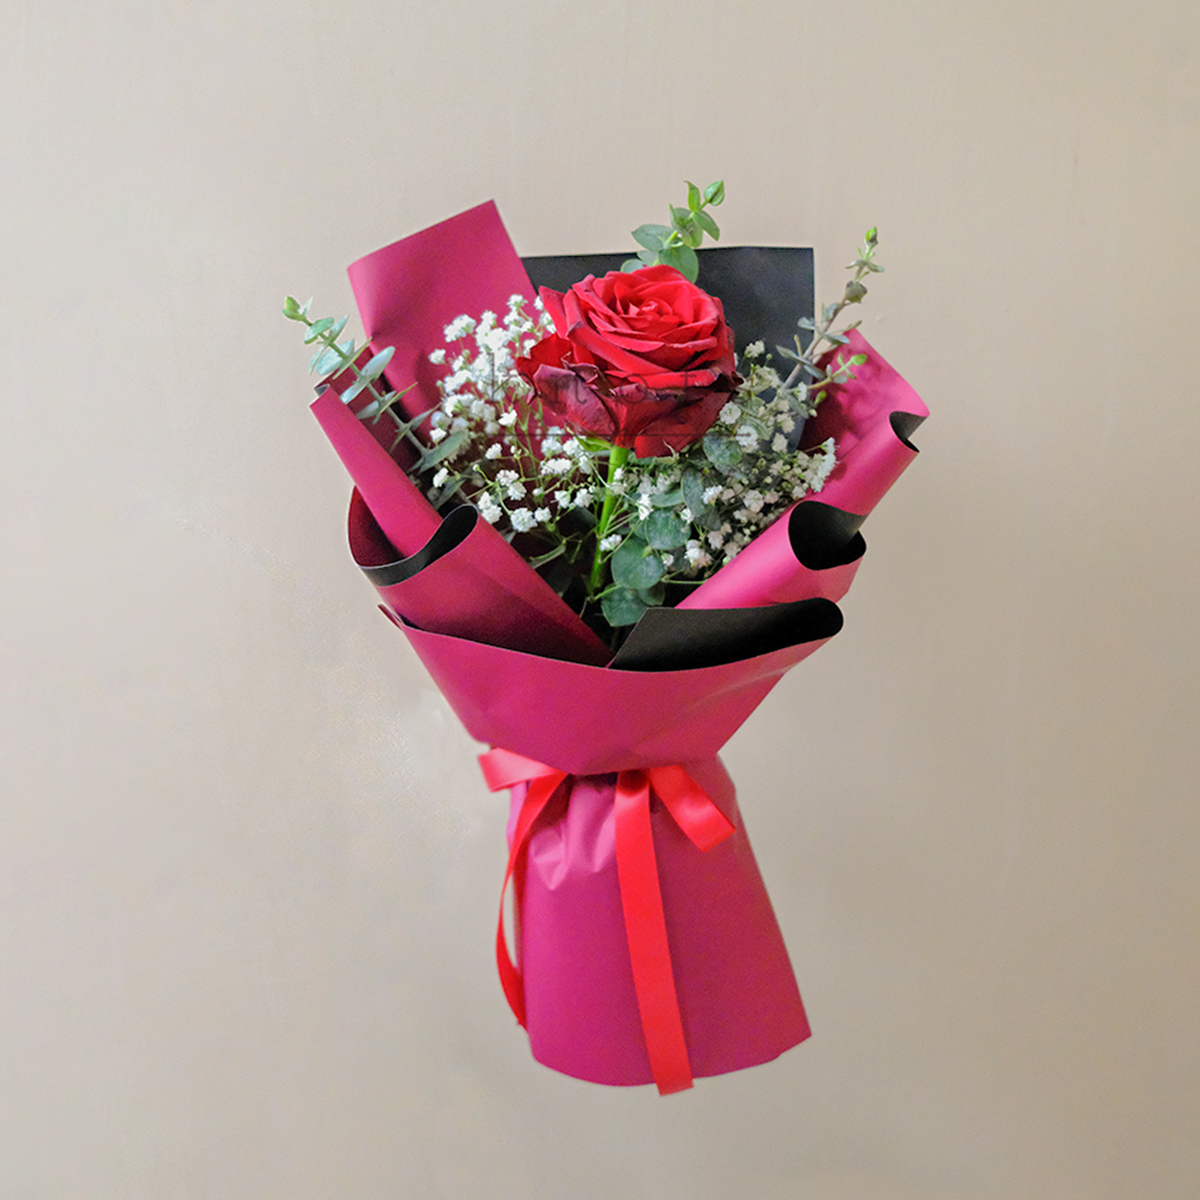 Amarla (Ecuadorian Red Rose Bouquet)